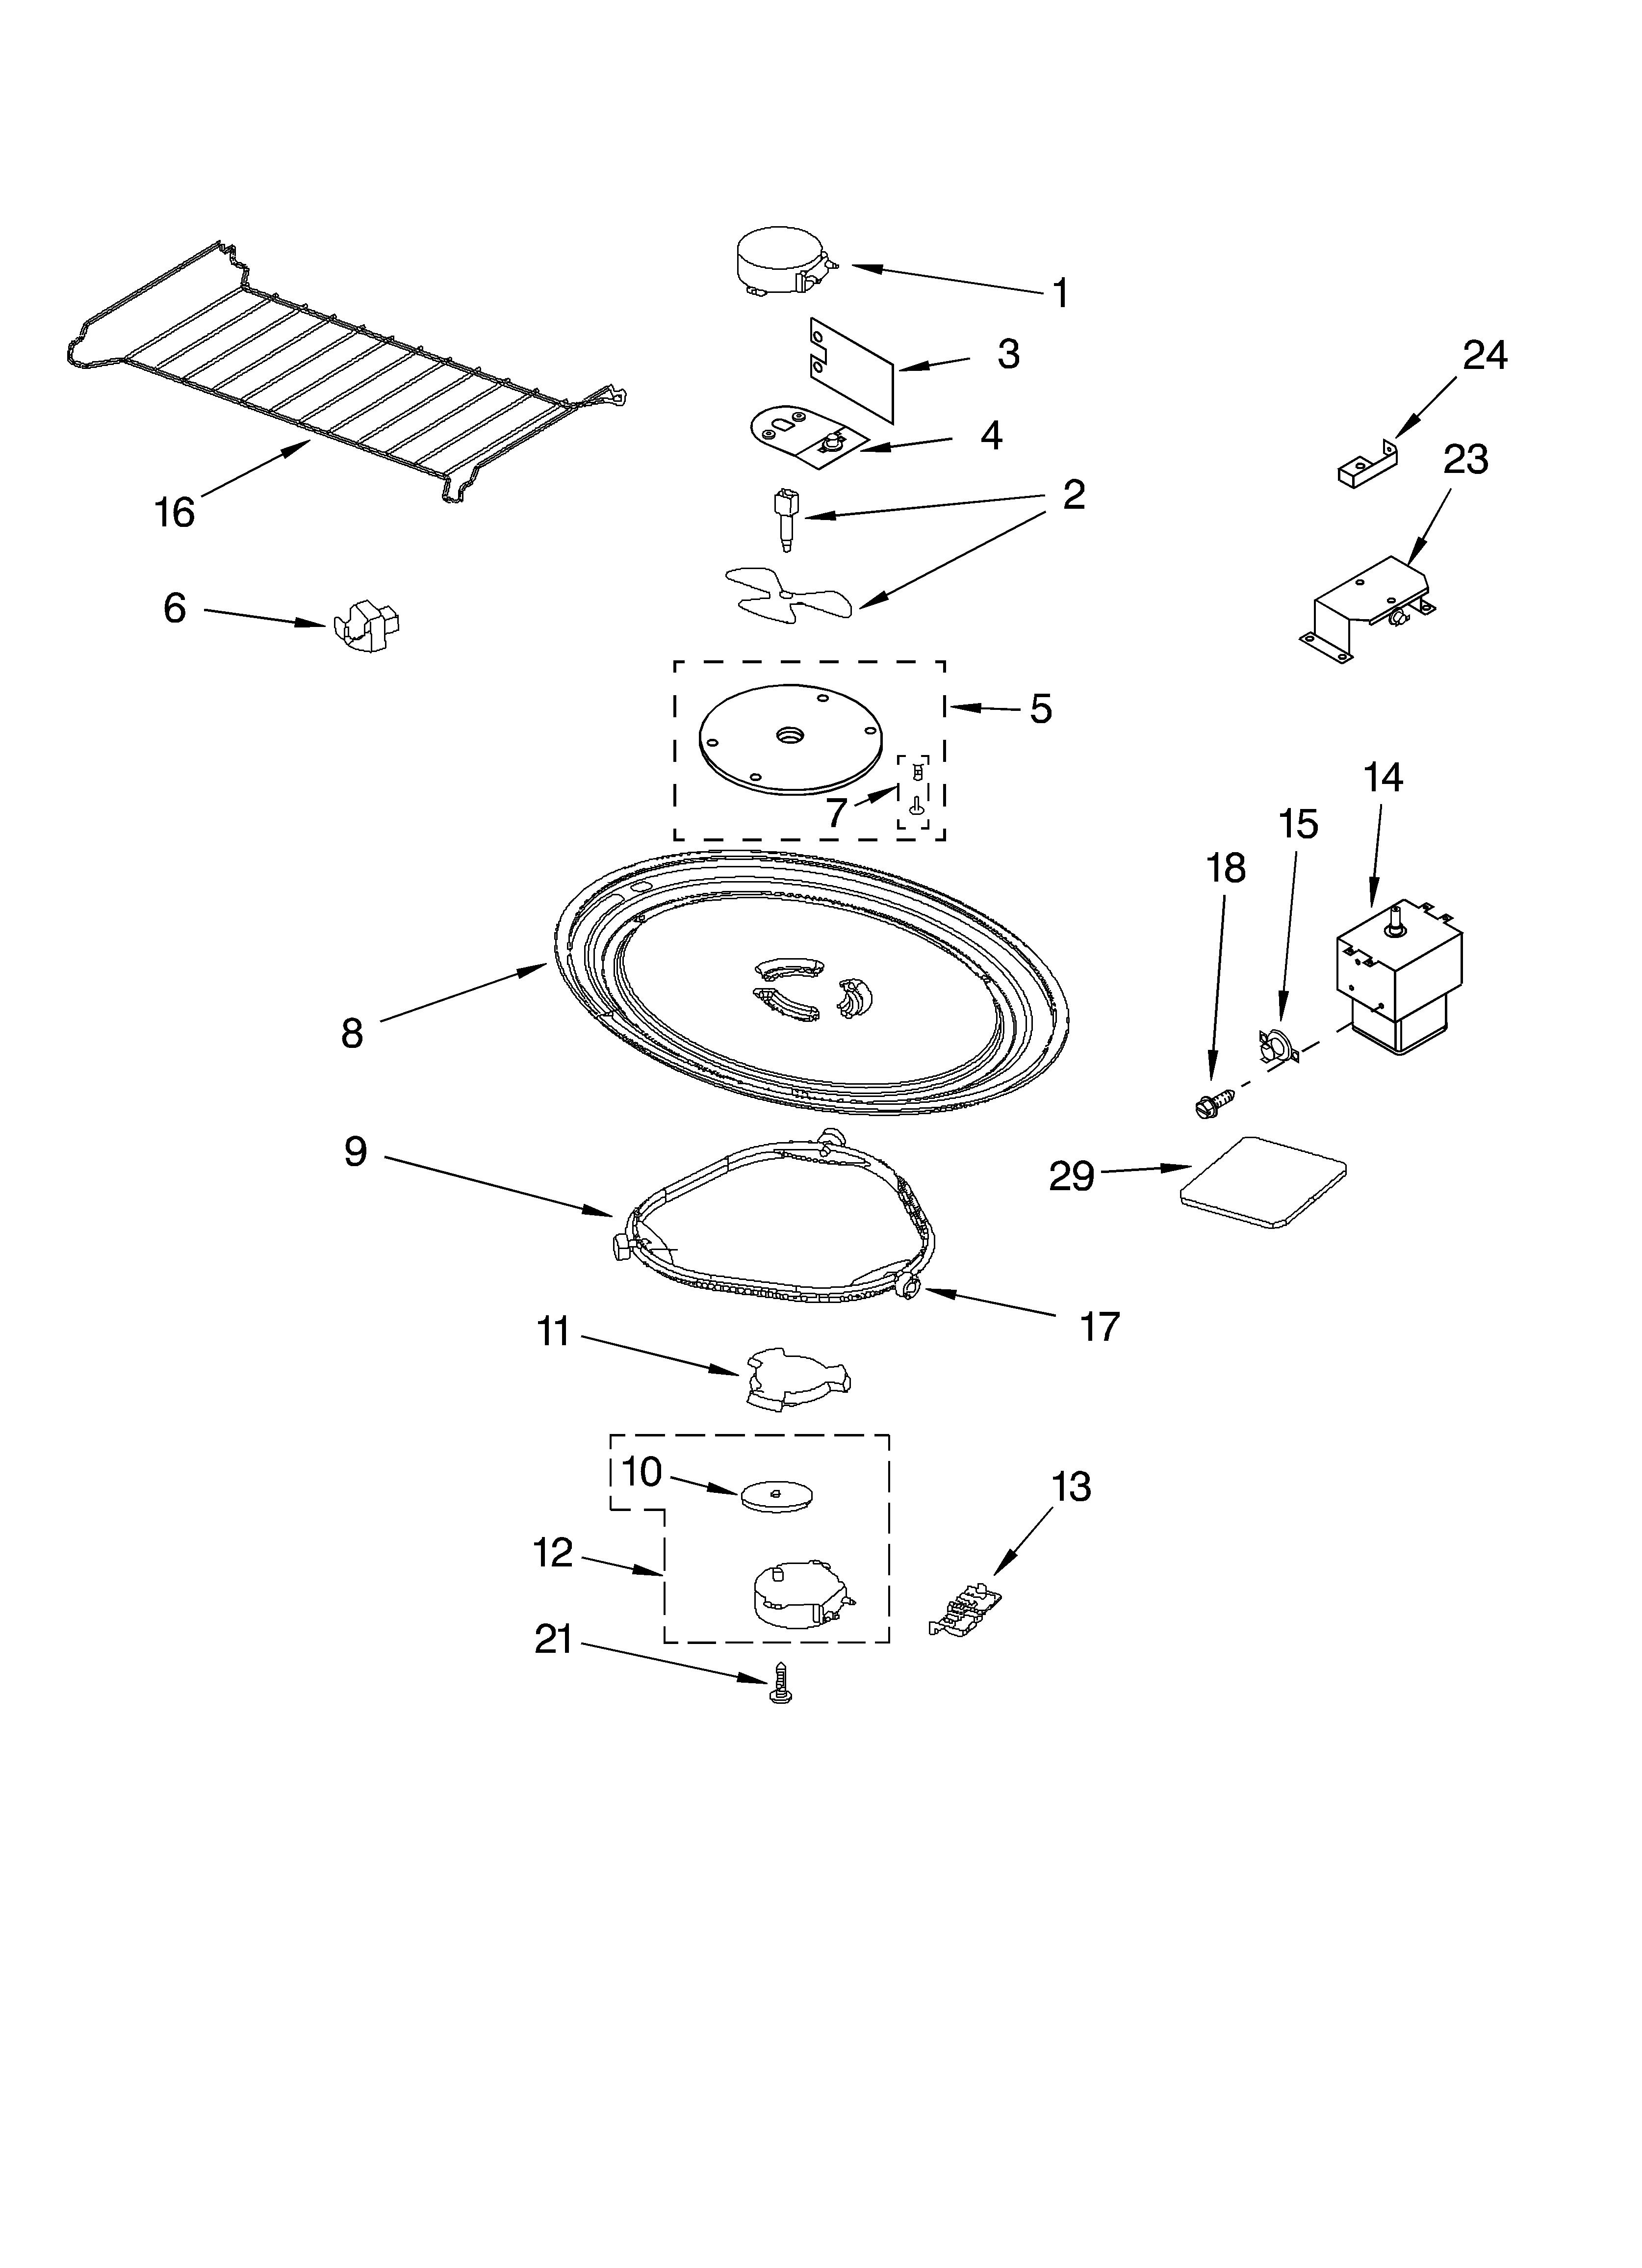 Whirlpool Mh9181xmb0 Turntable Motor